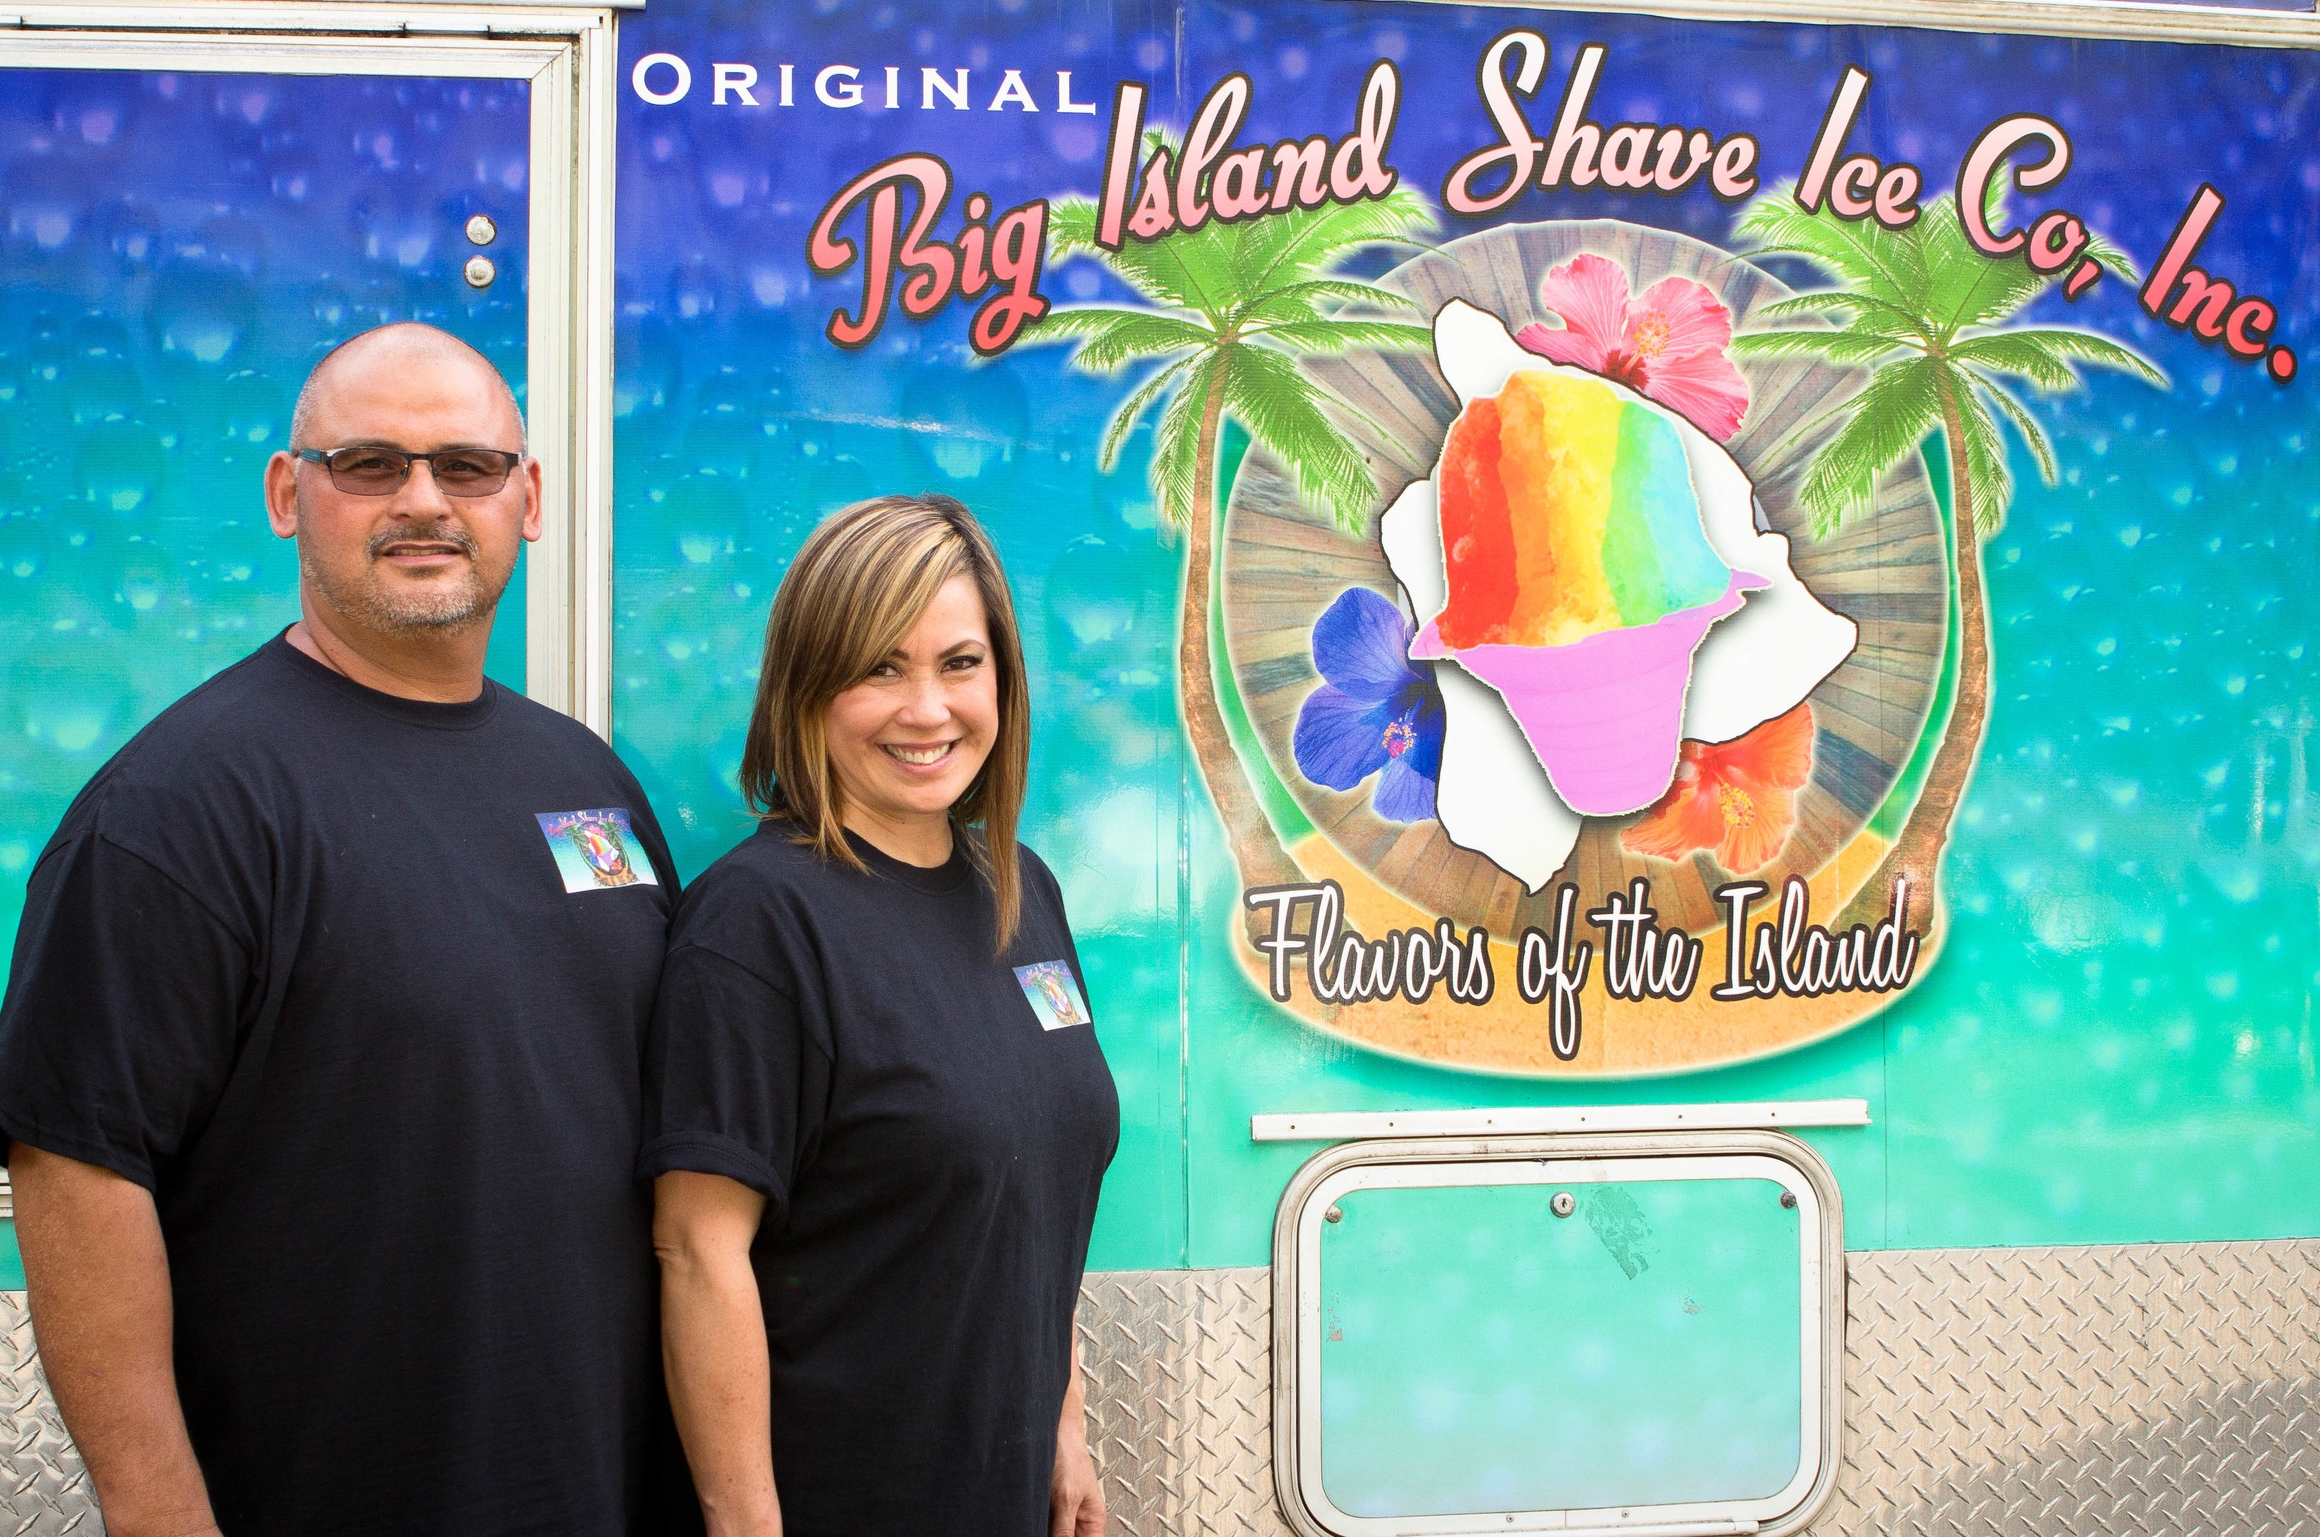 OBISIC Owners,Reggie and Kim Ignacio